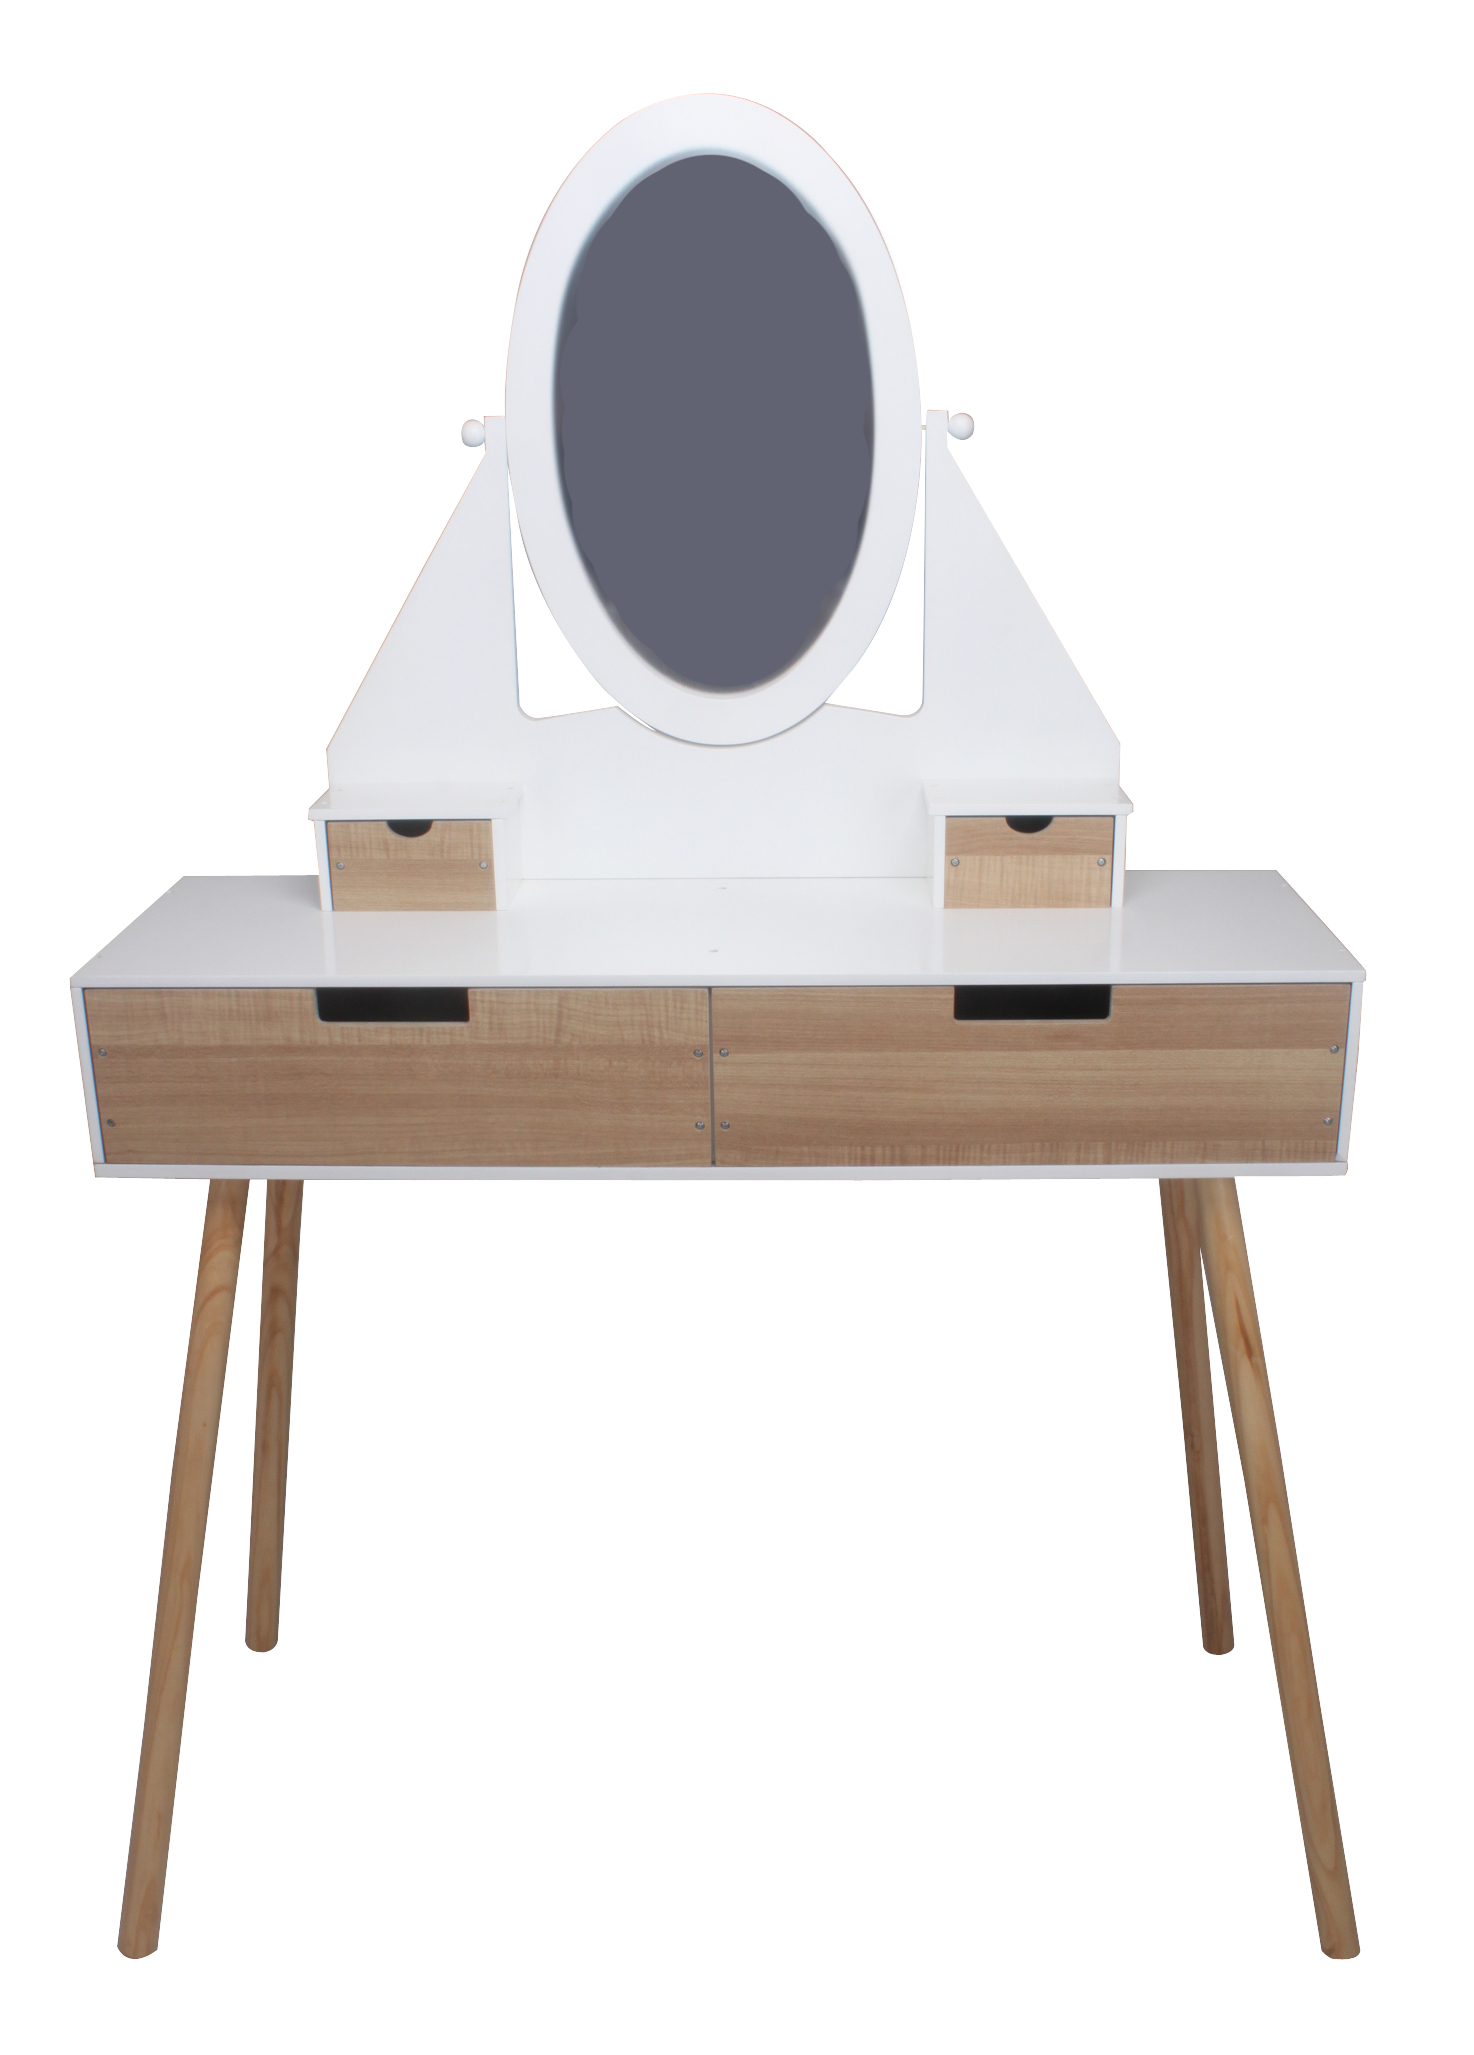 schminktisch kinderschminktisch frisiertisch kindertisch hocker frisierkommode ebay. Black Bedroom Furniture Sets. Home Design Ideas